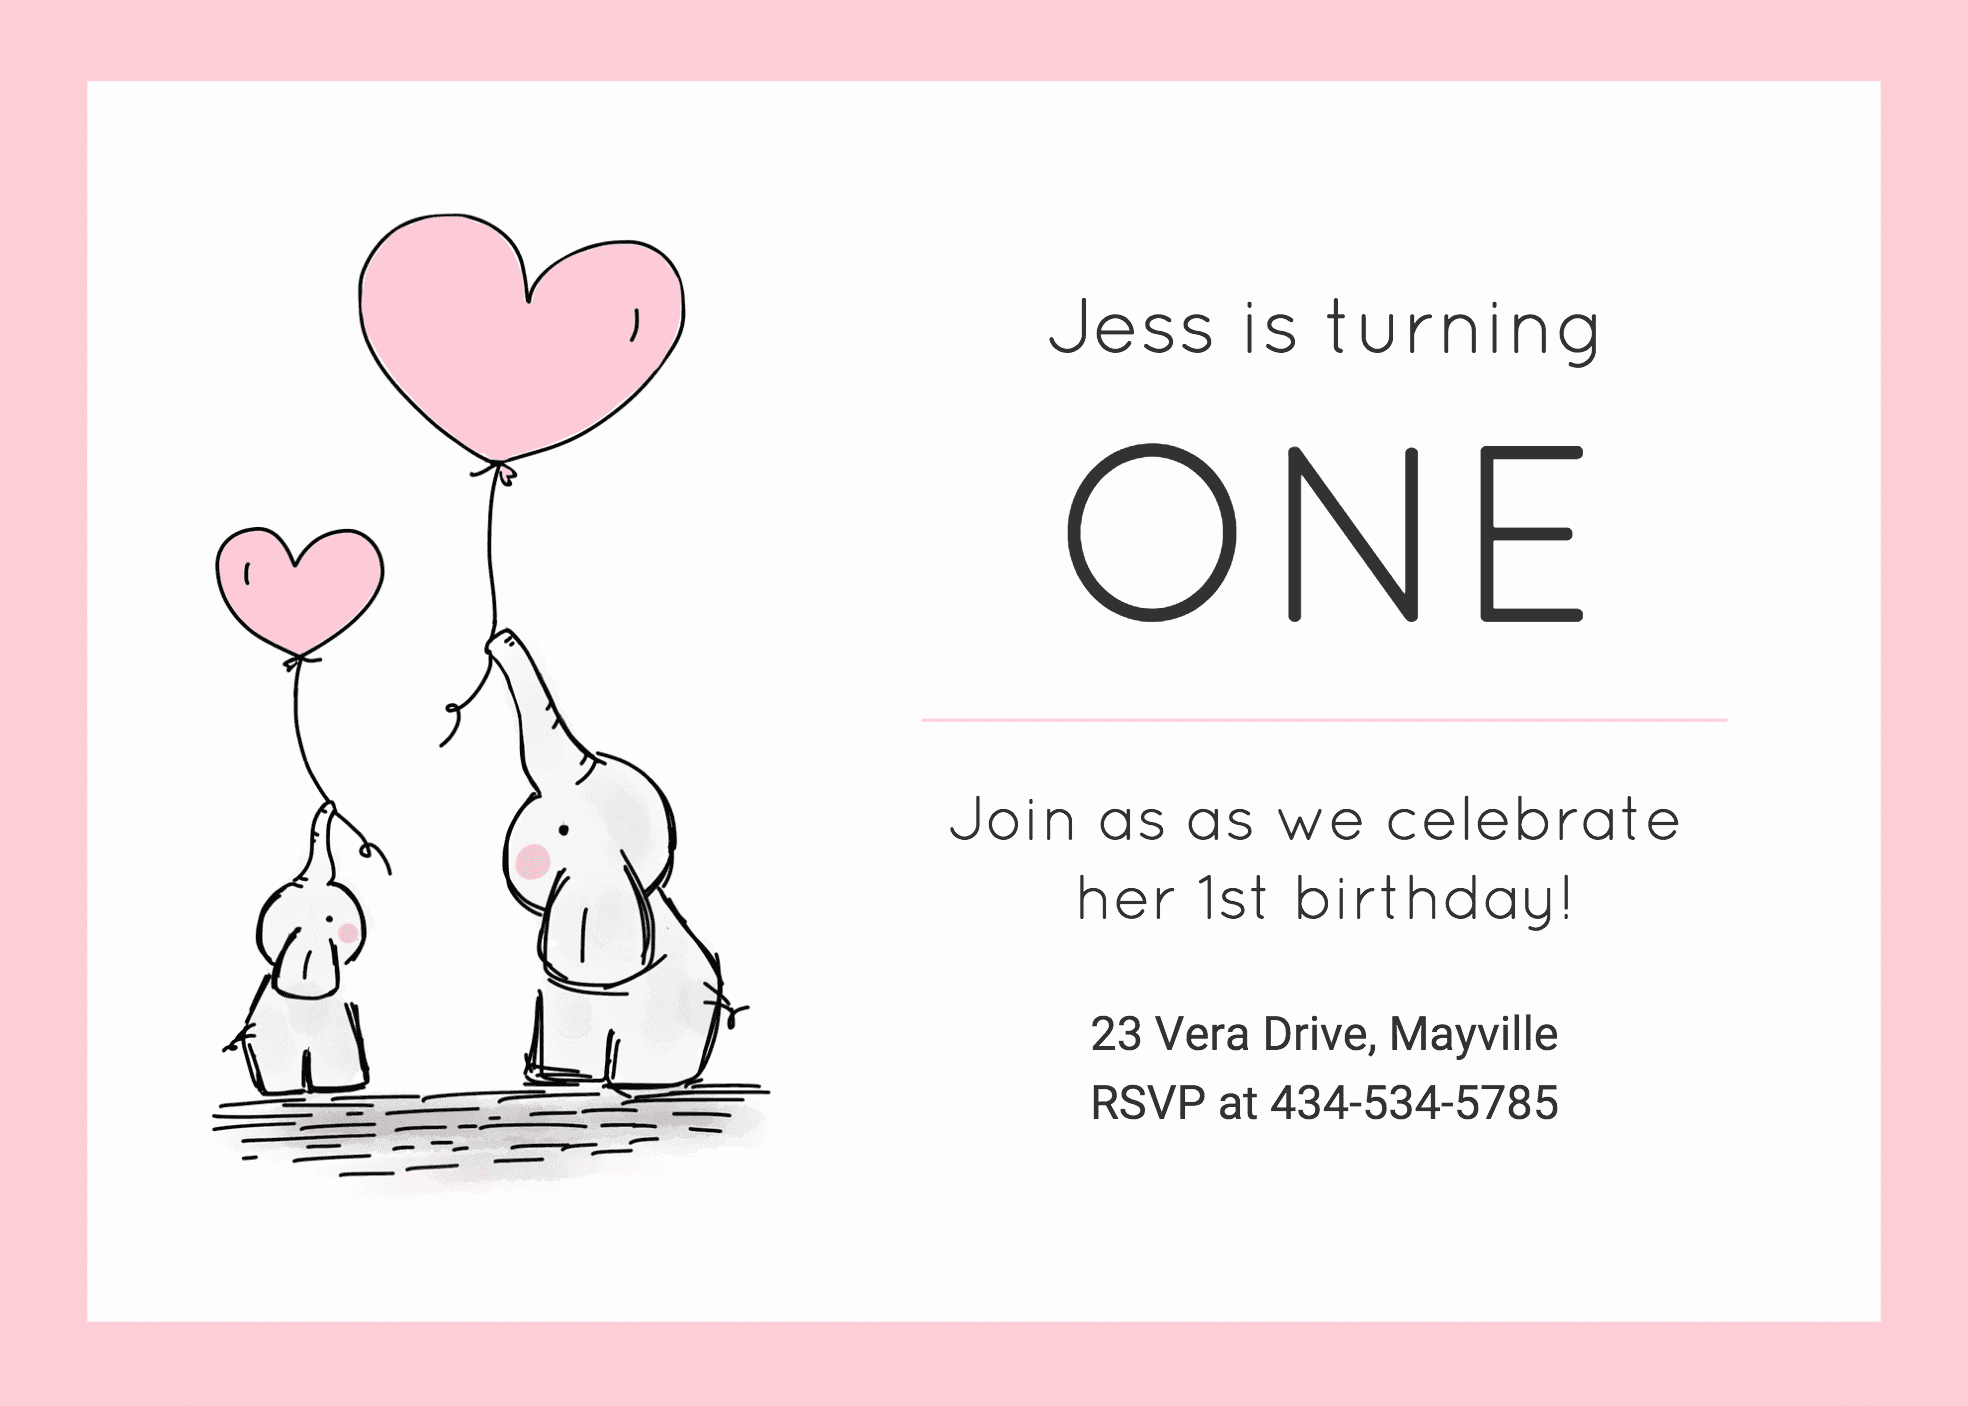 Birthday Invitation Card Ideas Inspirational 10 Creative Birthday Invitation Card Design Tips